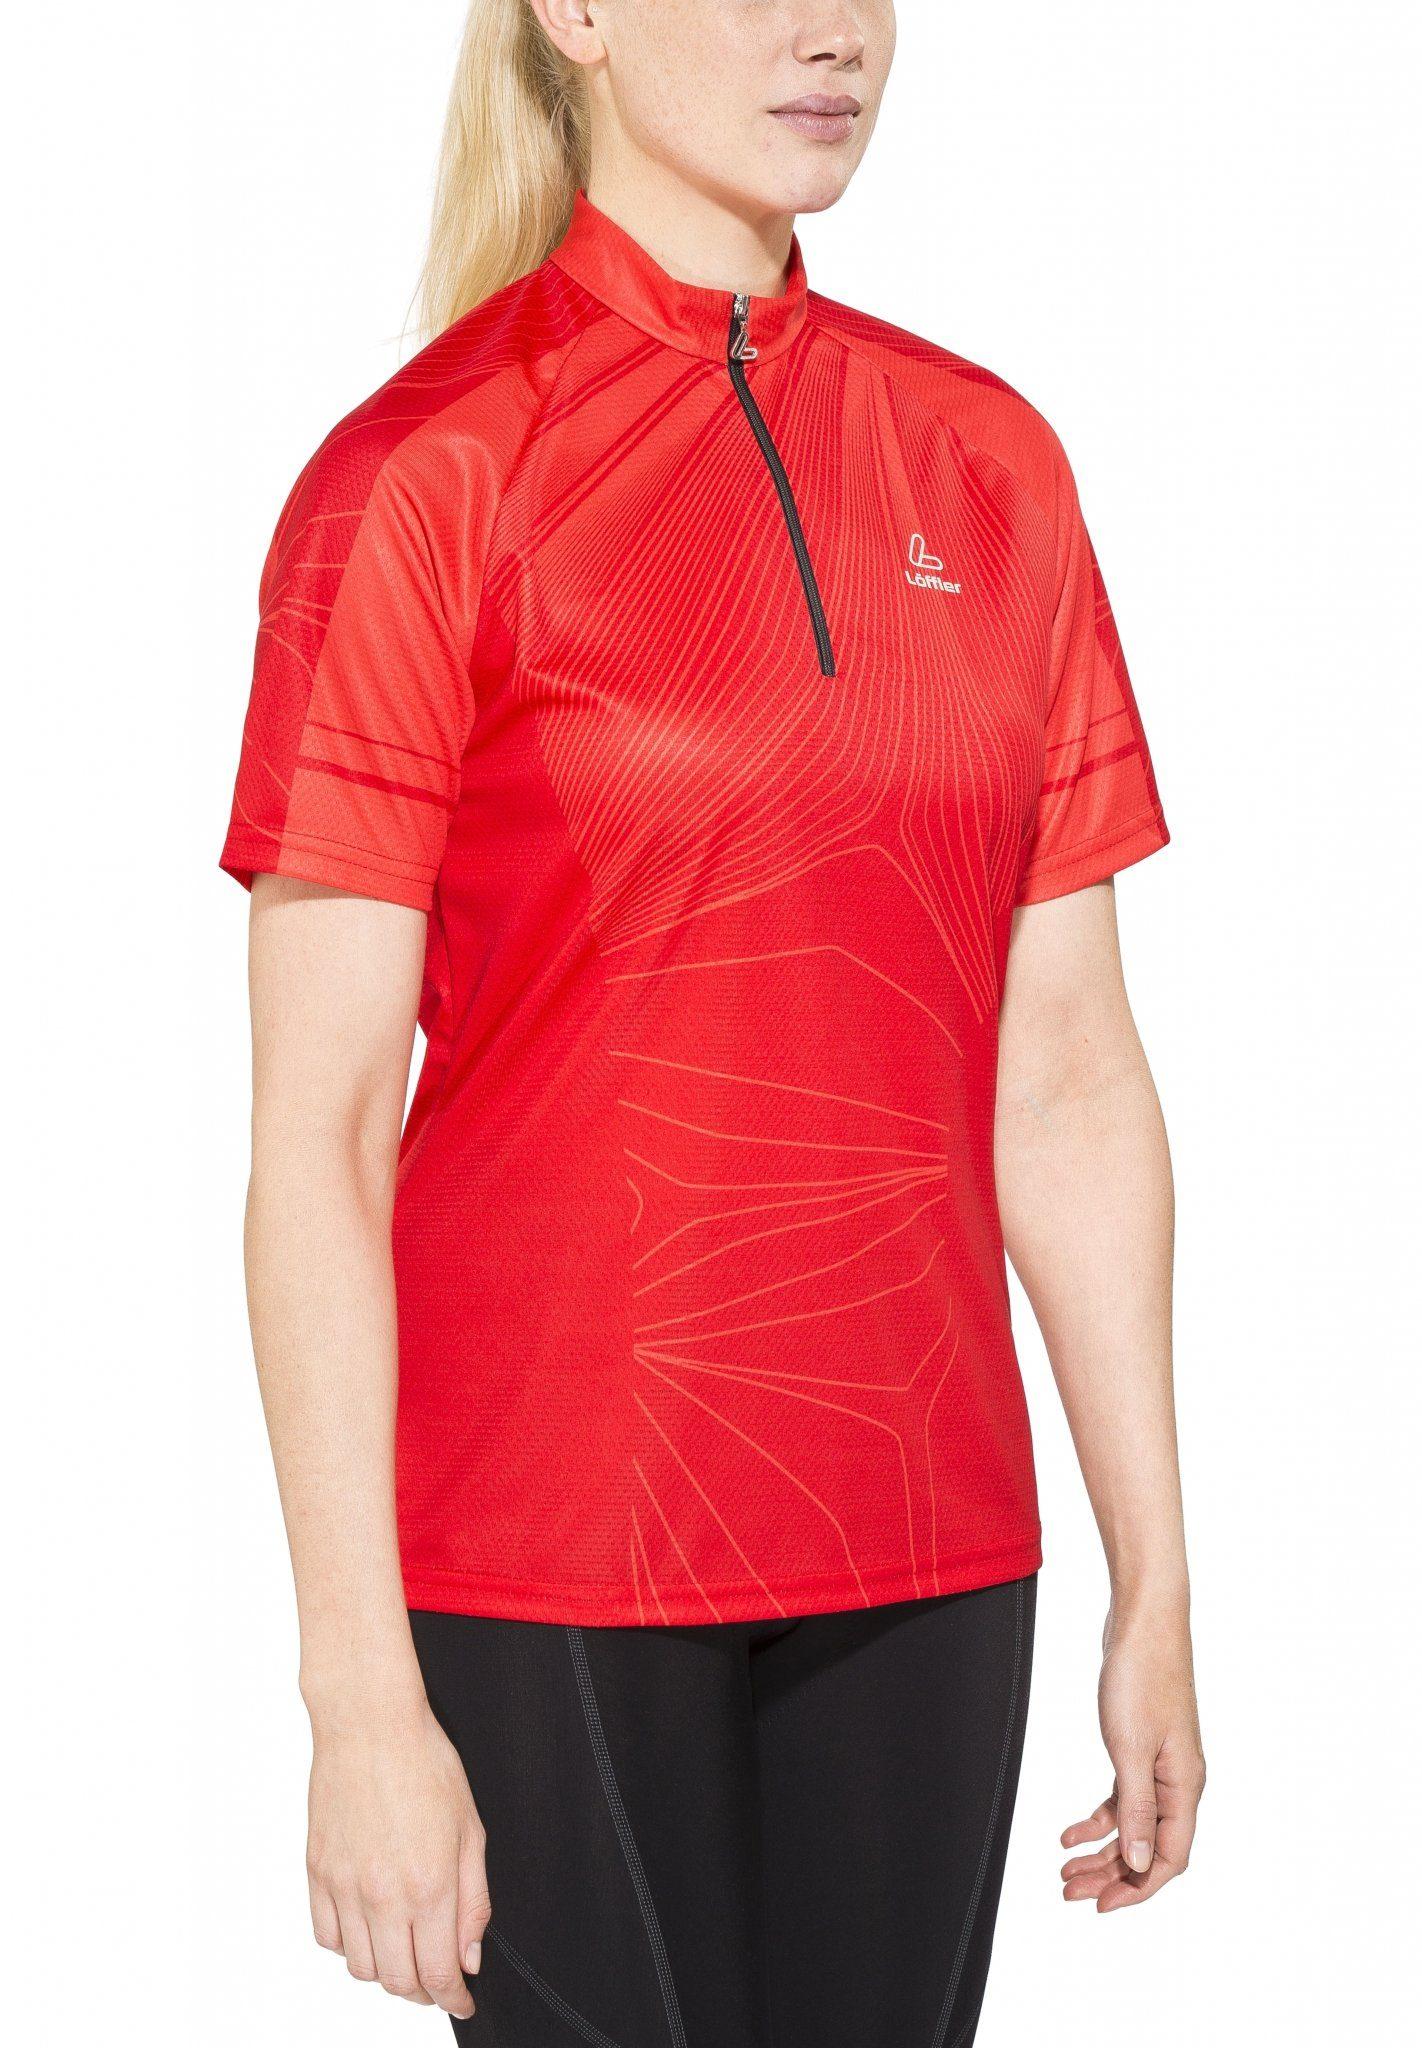 Löffler Radtrikot »Bike Shirt HZ«